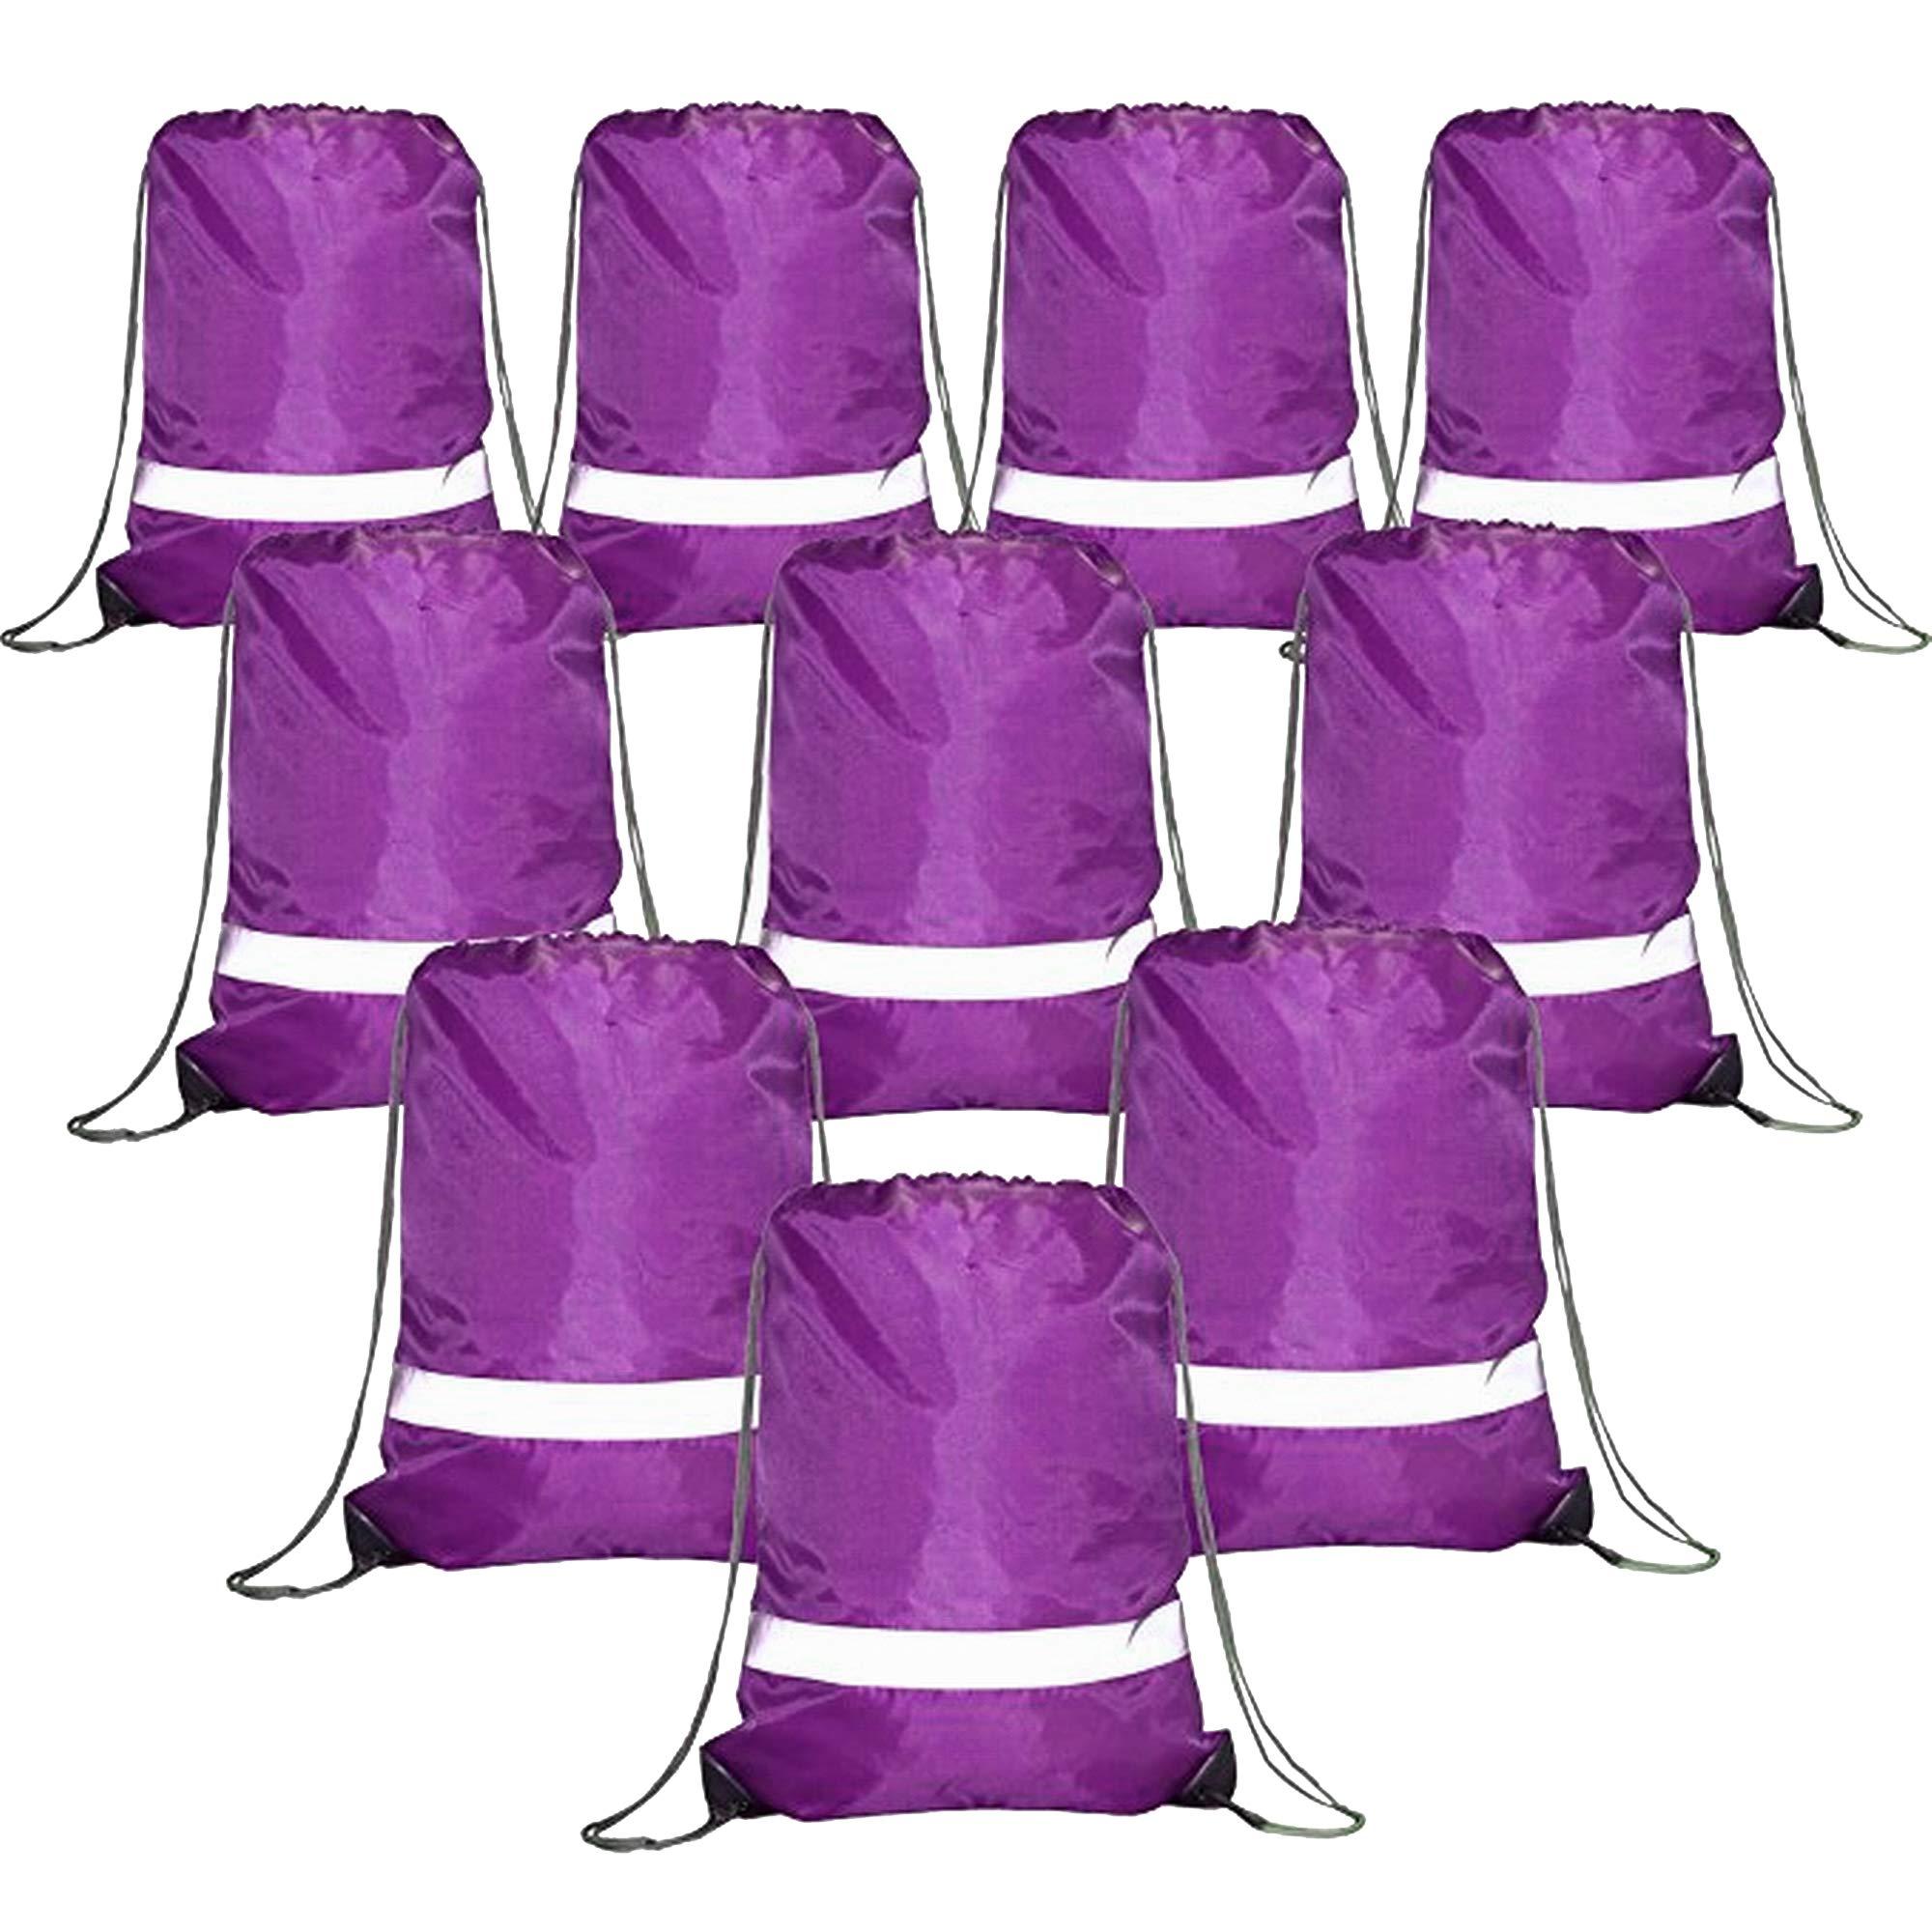 Drawstring Backpack Bags Reflective Bulk Pack, Promotional Sport Gym Sack Cinch Bags (10 Purple)